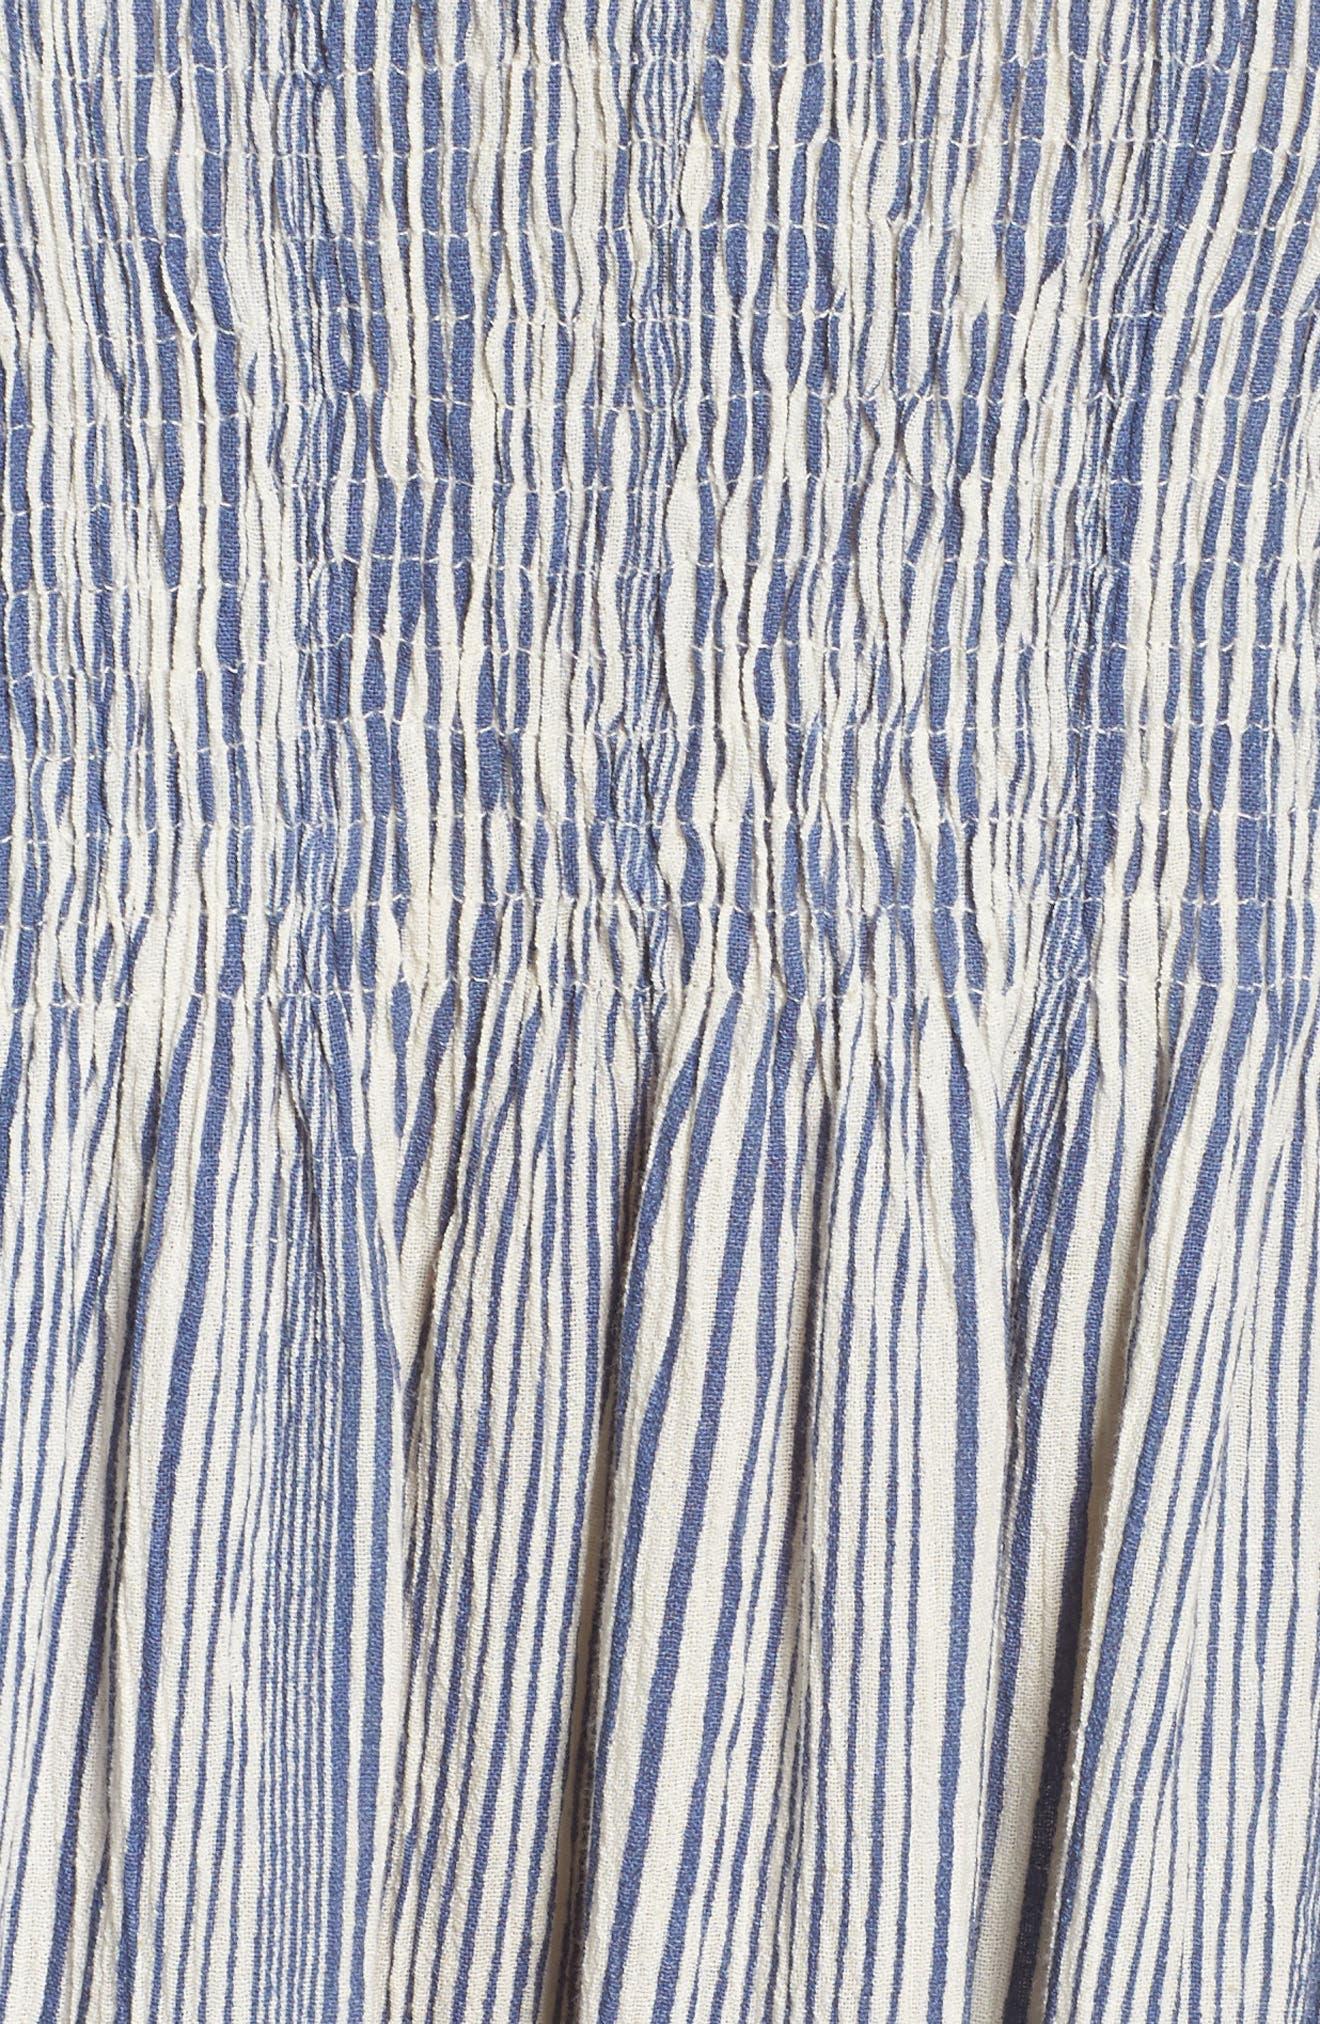 Serge Smocked Dress,                             Alternate thumbnail 5, color,                             Indian Ocean